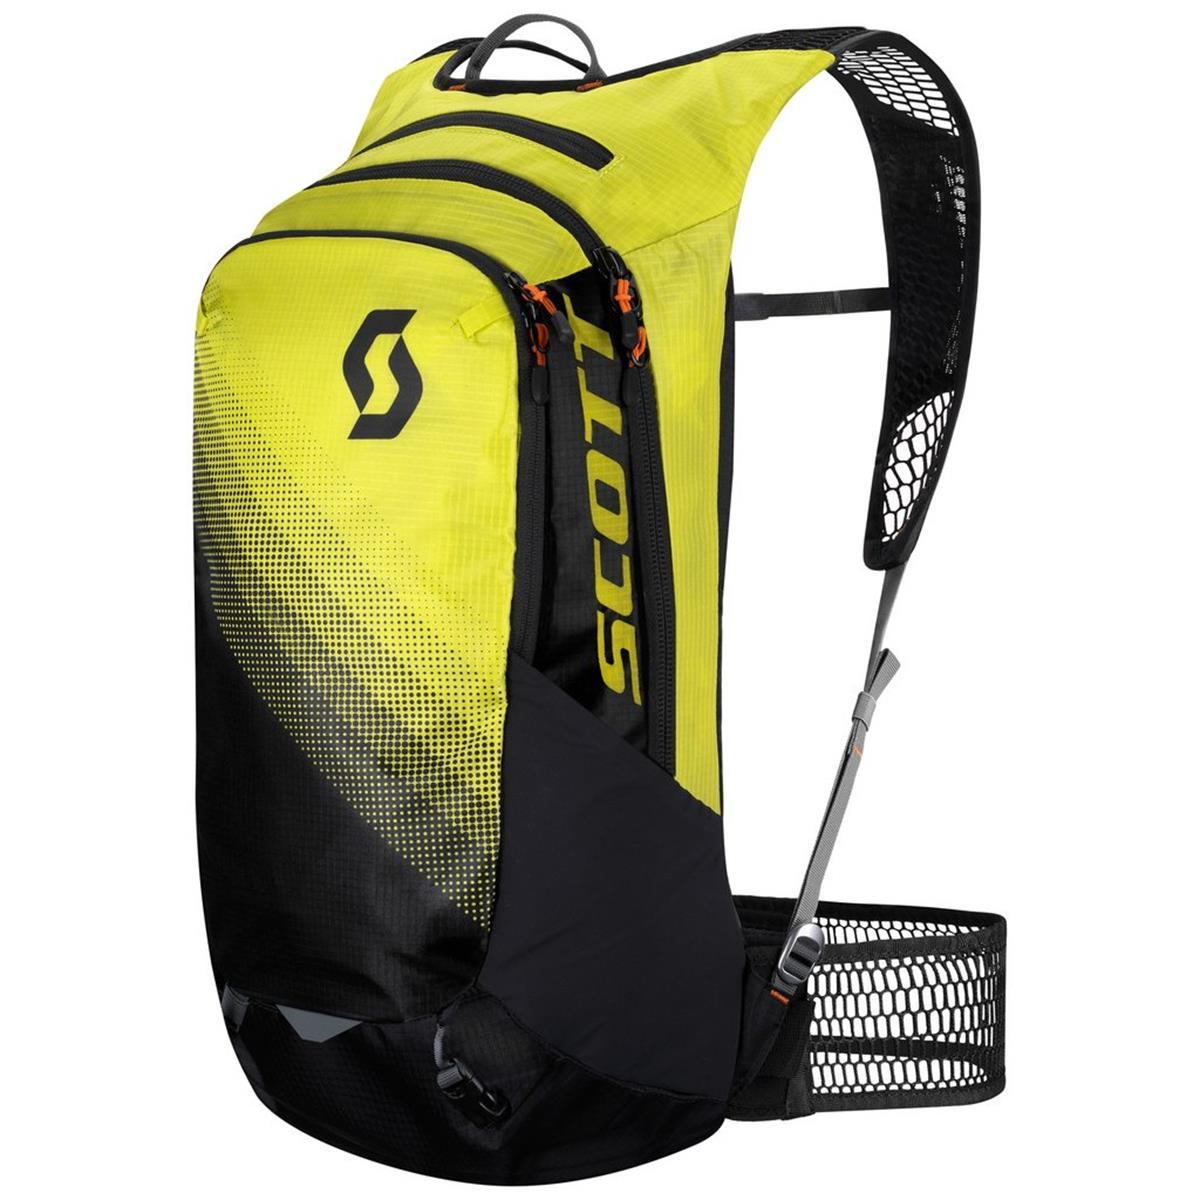 Scott Protektor-Rucksack, 20 Liter Trail Protect EVO FR 20 Sulphur Yellow/Caviar Black